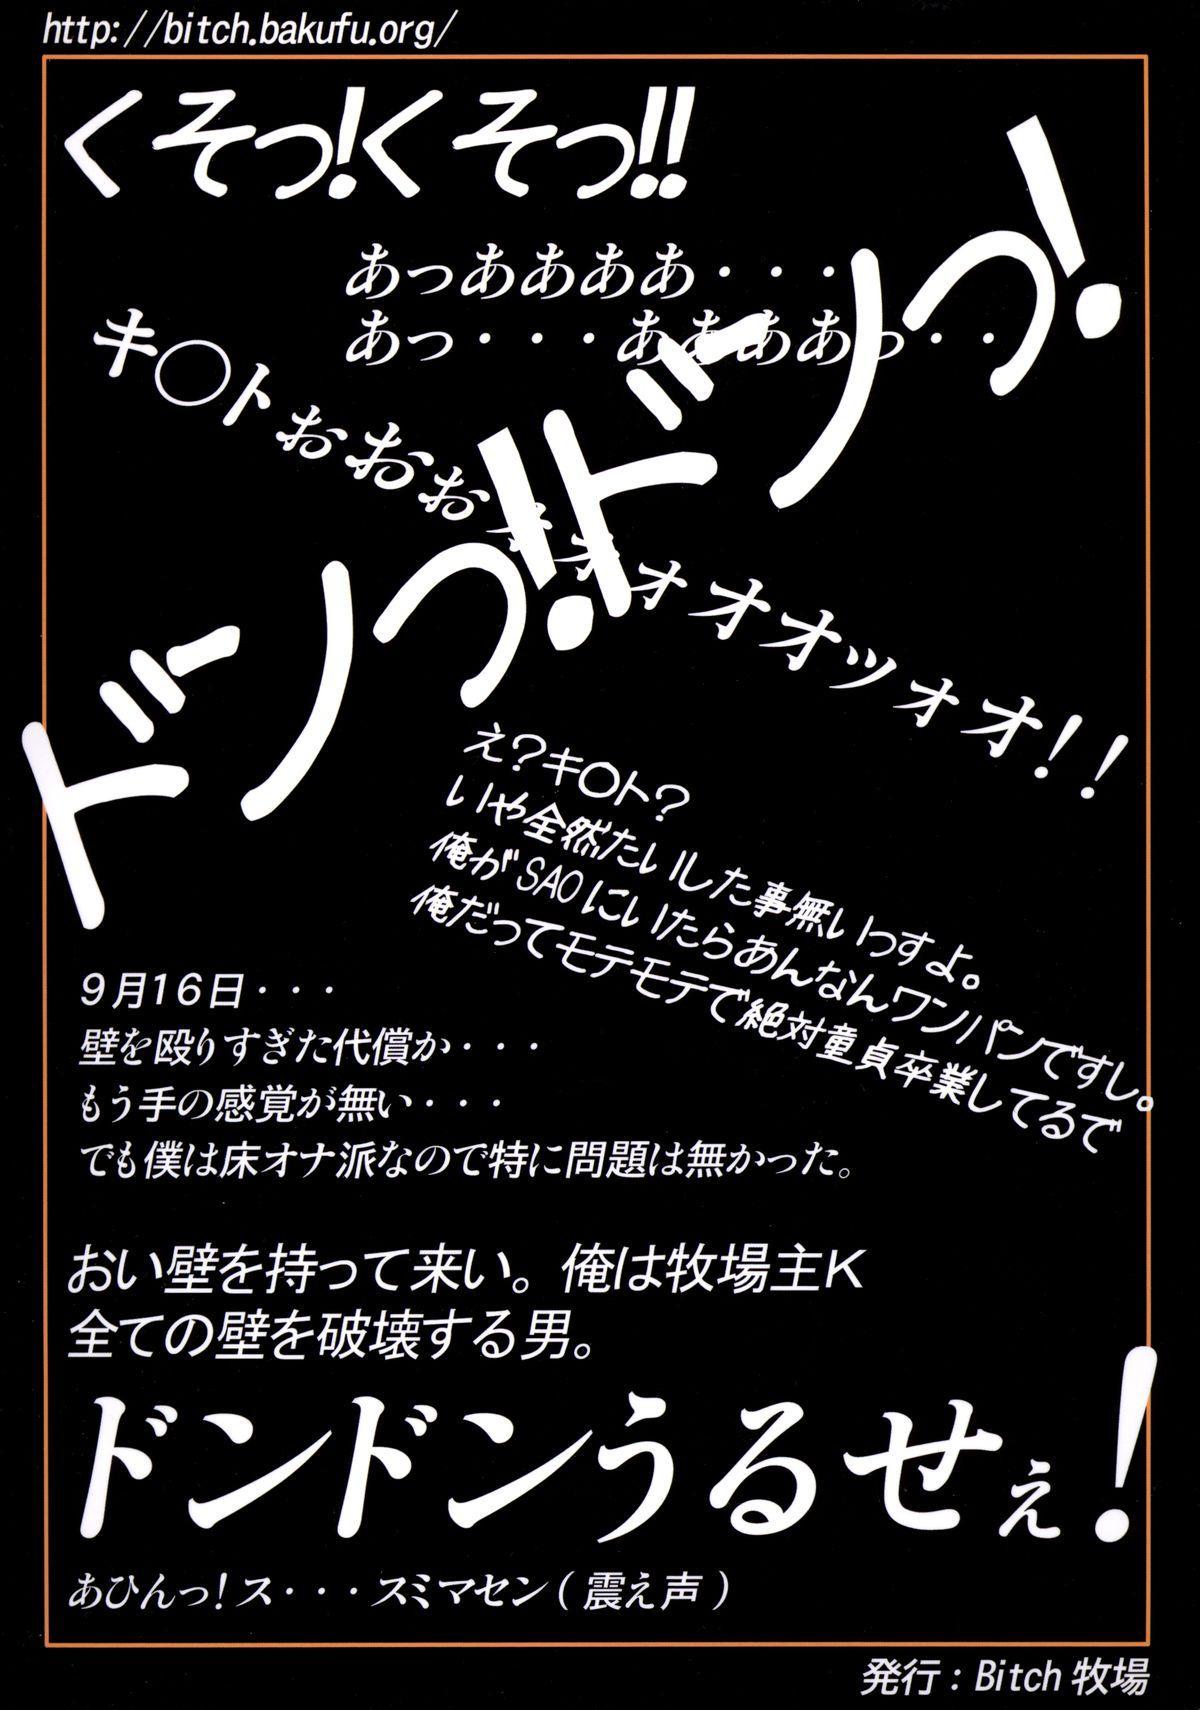 Irakabeshi Sugite Atama ga Okashiku Natta Hito ga Kangaeta SAO-hon | A SAO Book Drawn by a Man Driven Insane by Bashing his Head Against a Wall 19